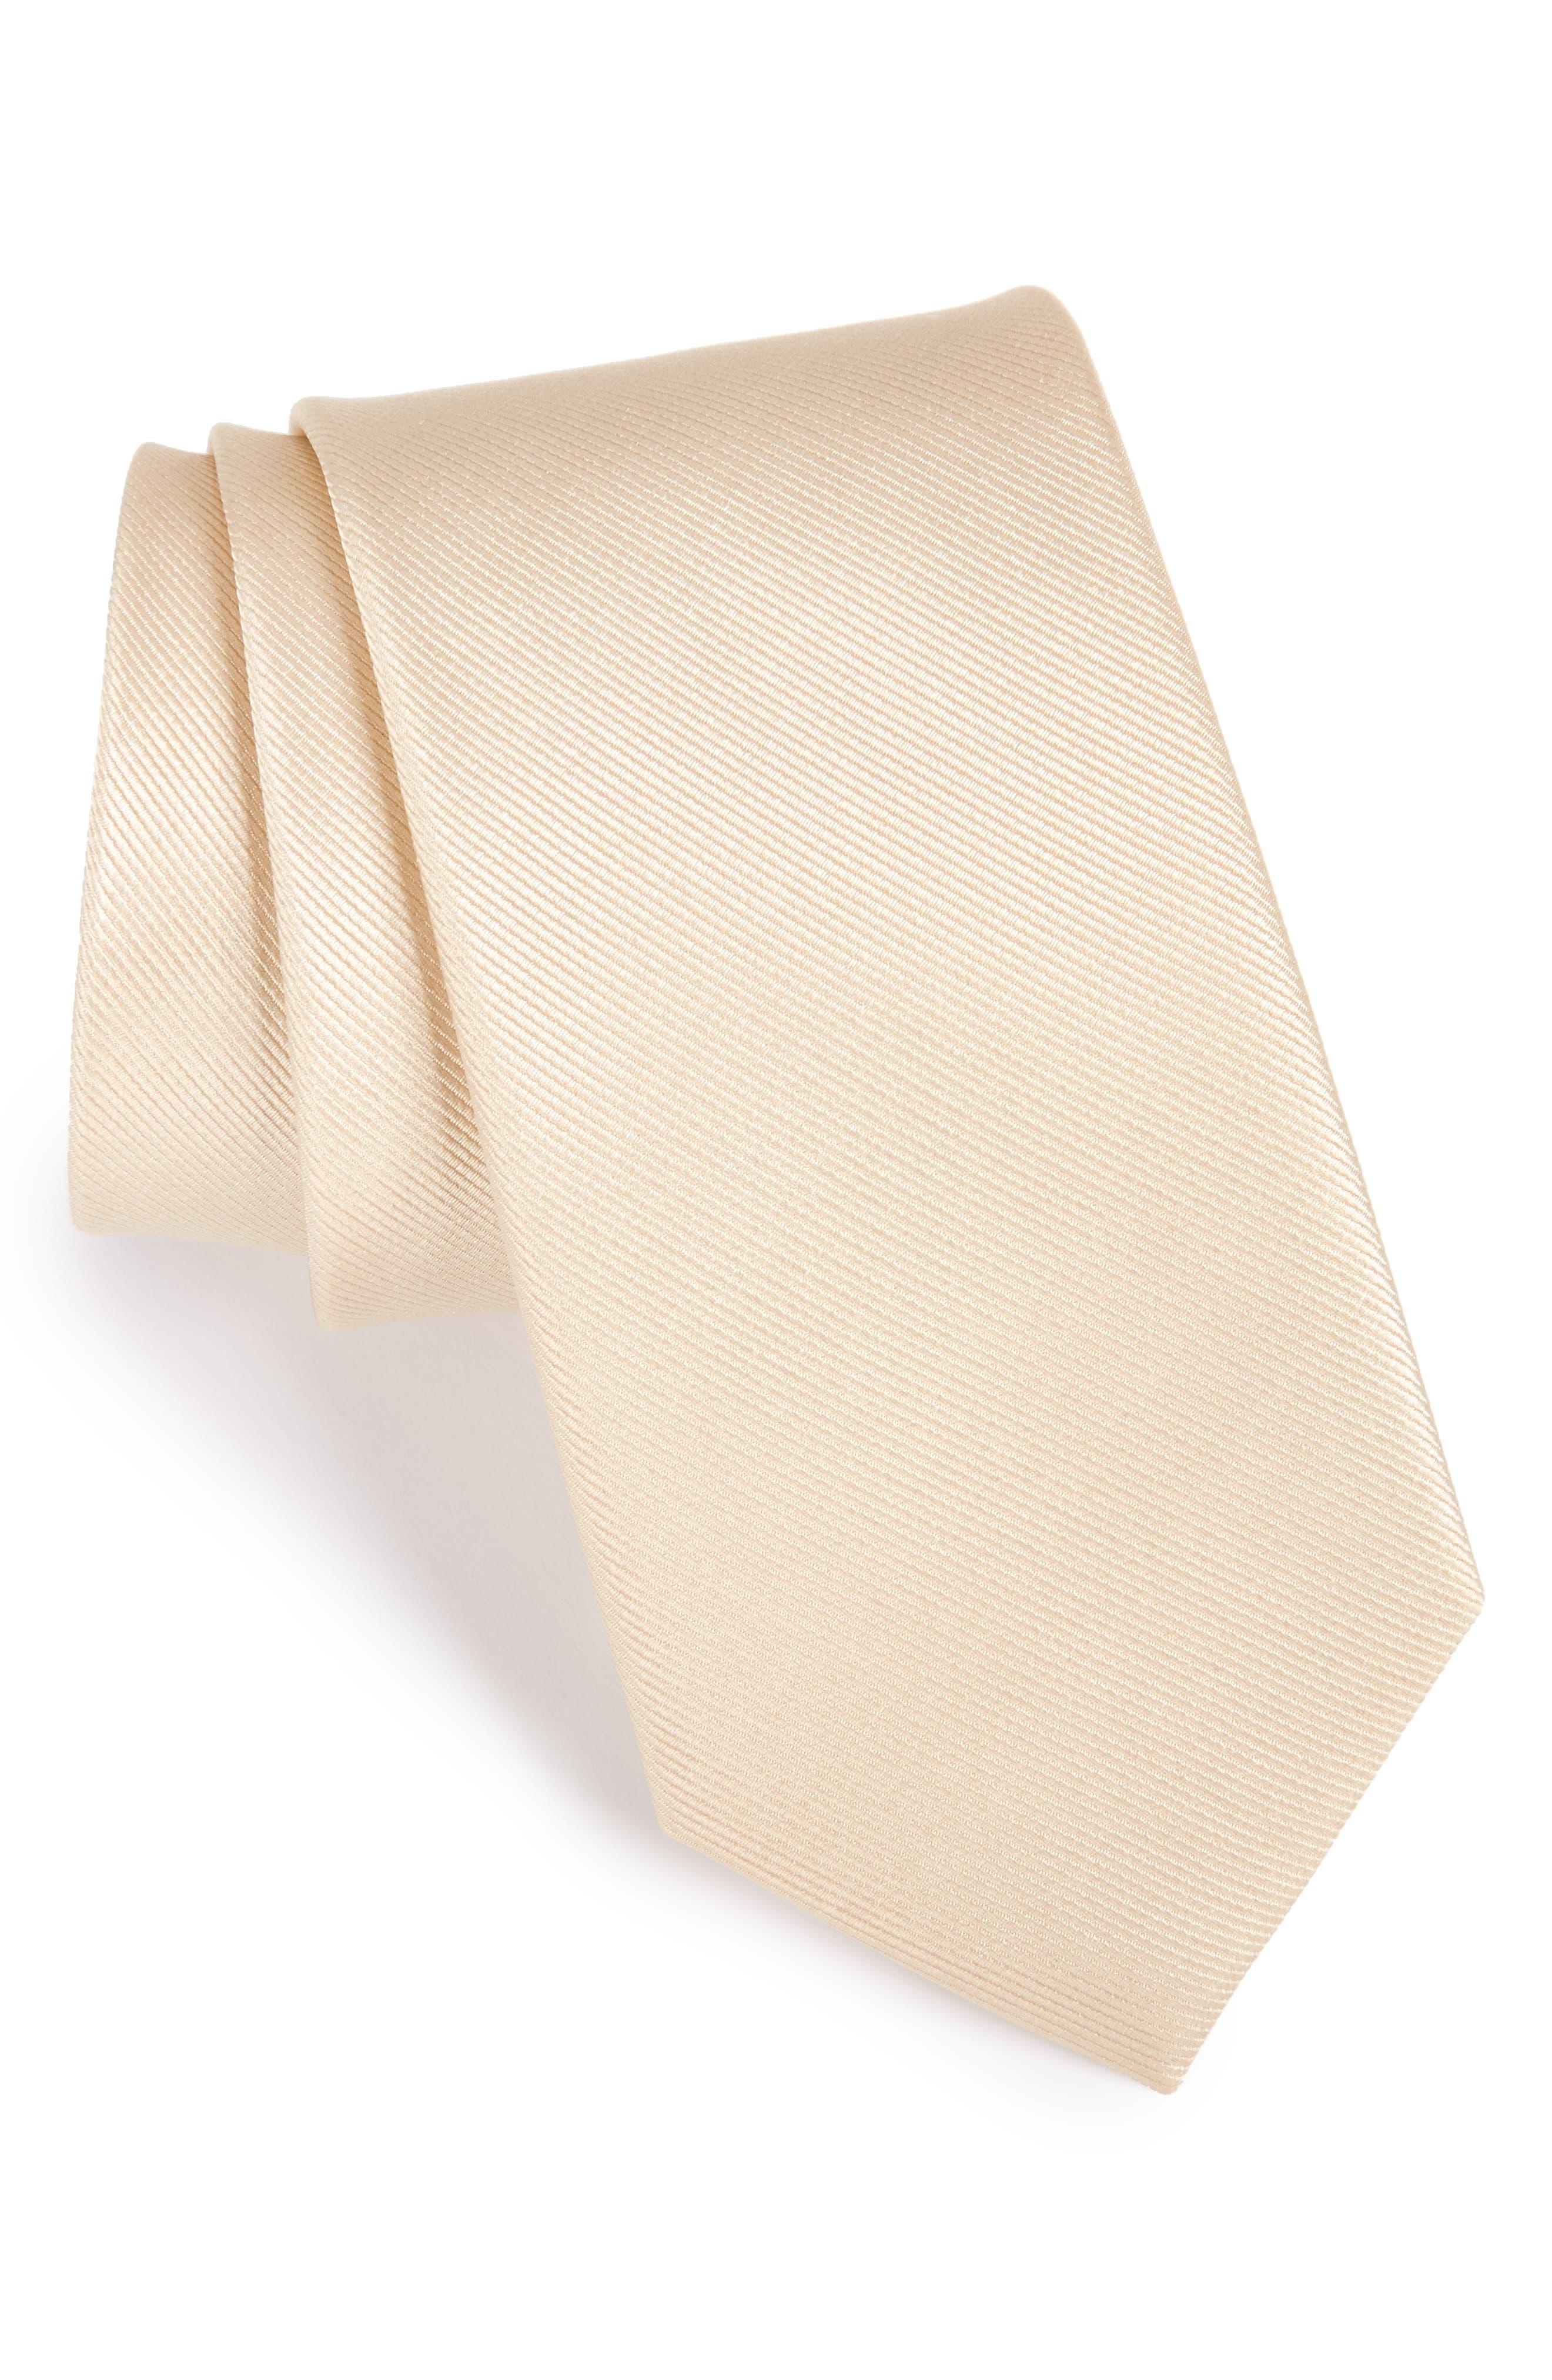 Main Image - The Tie Bar Grosgrain Silk Tie